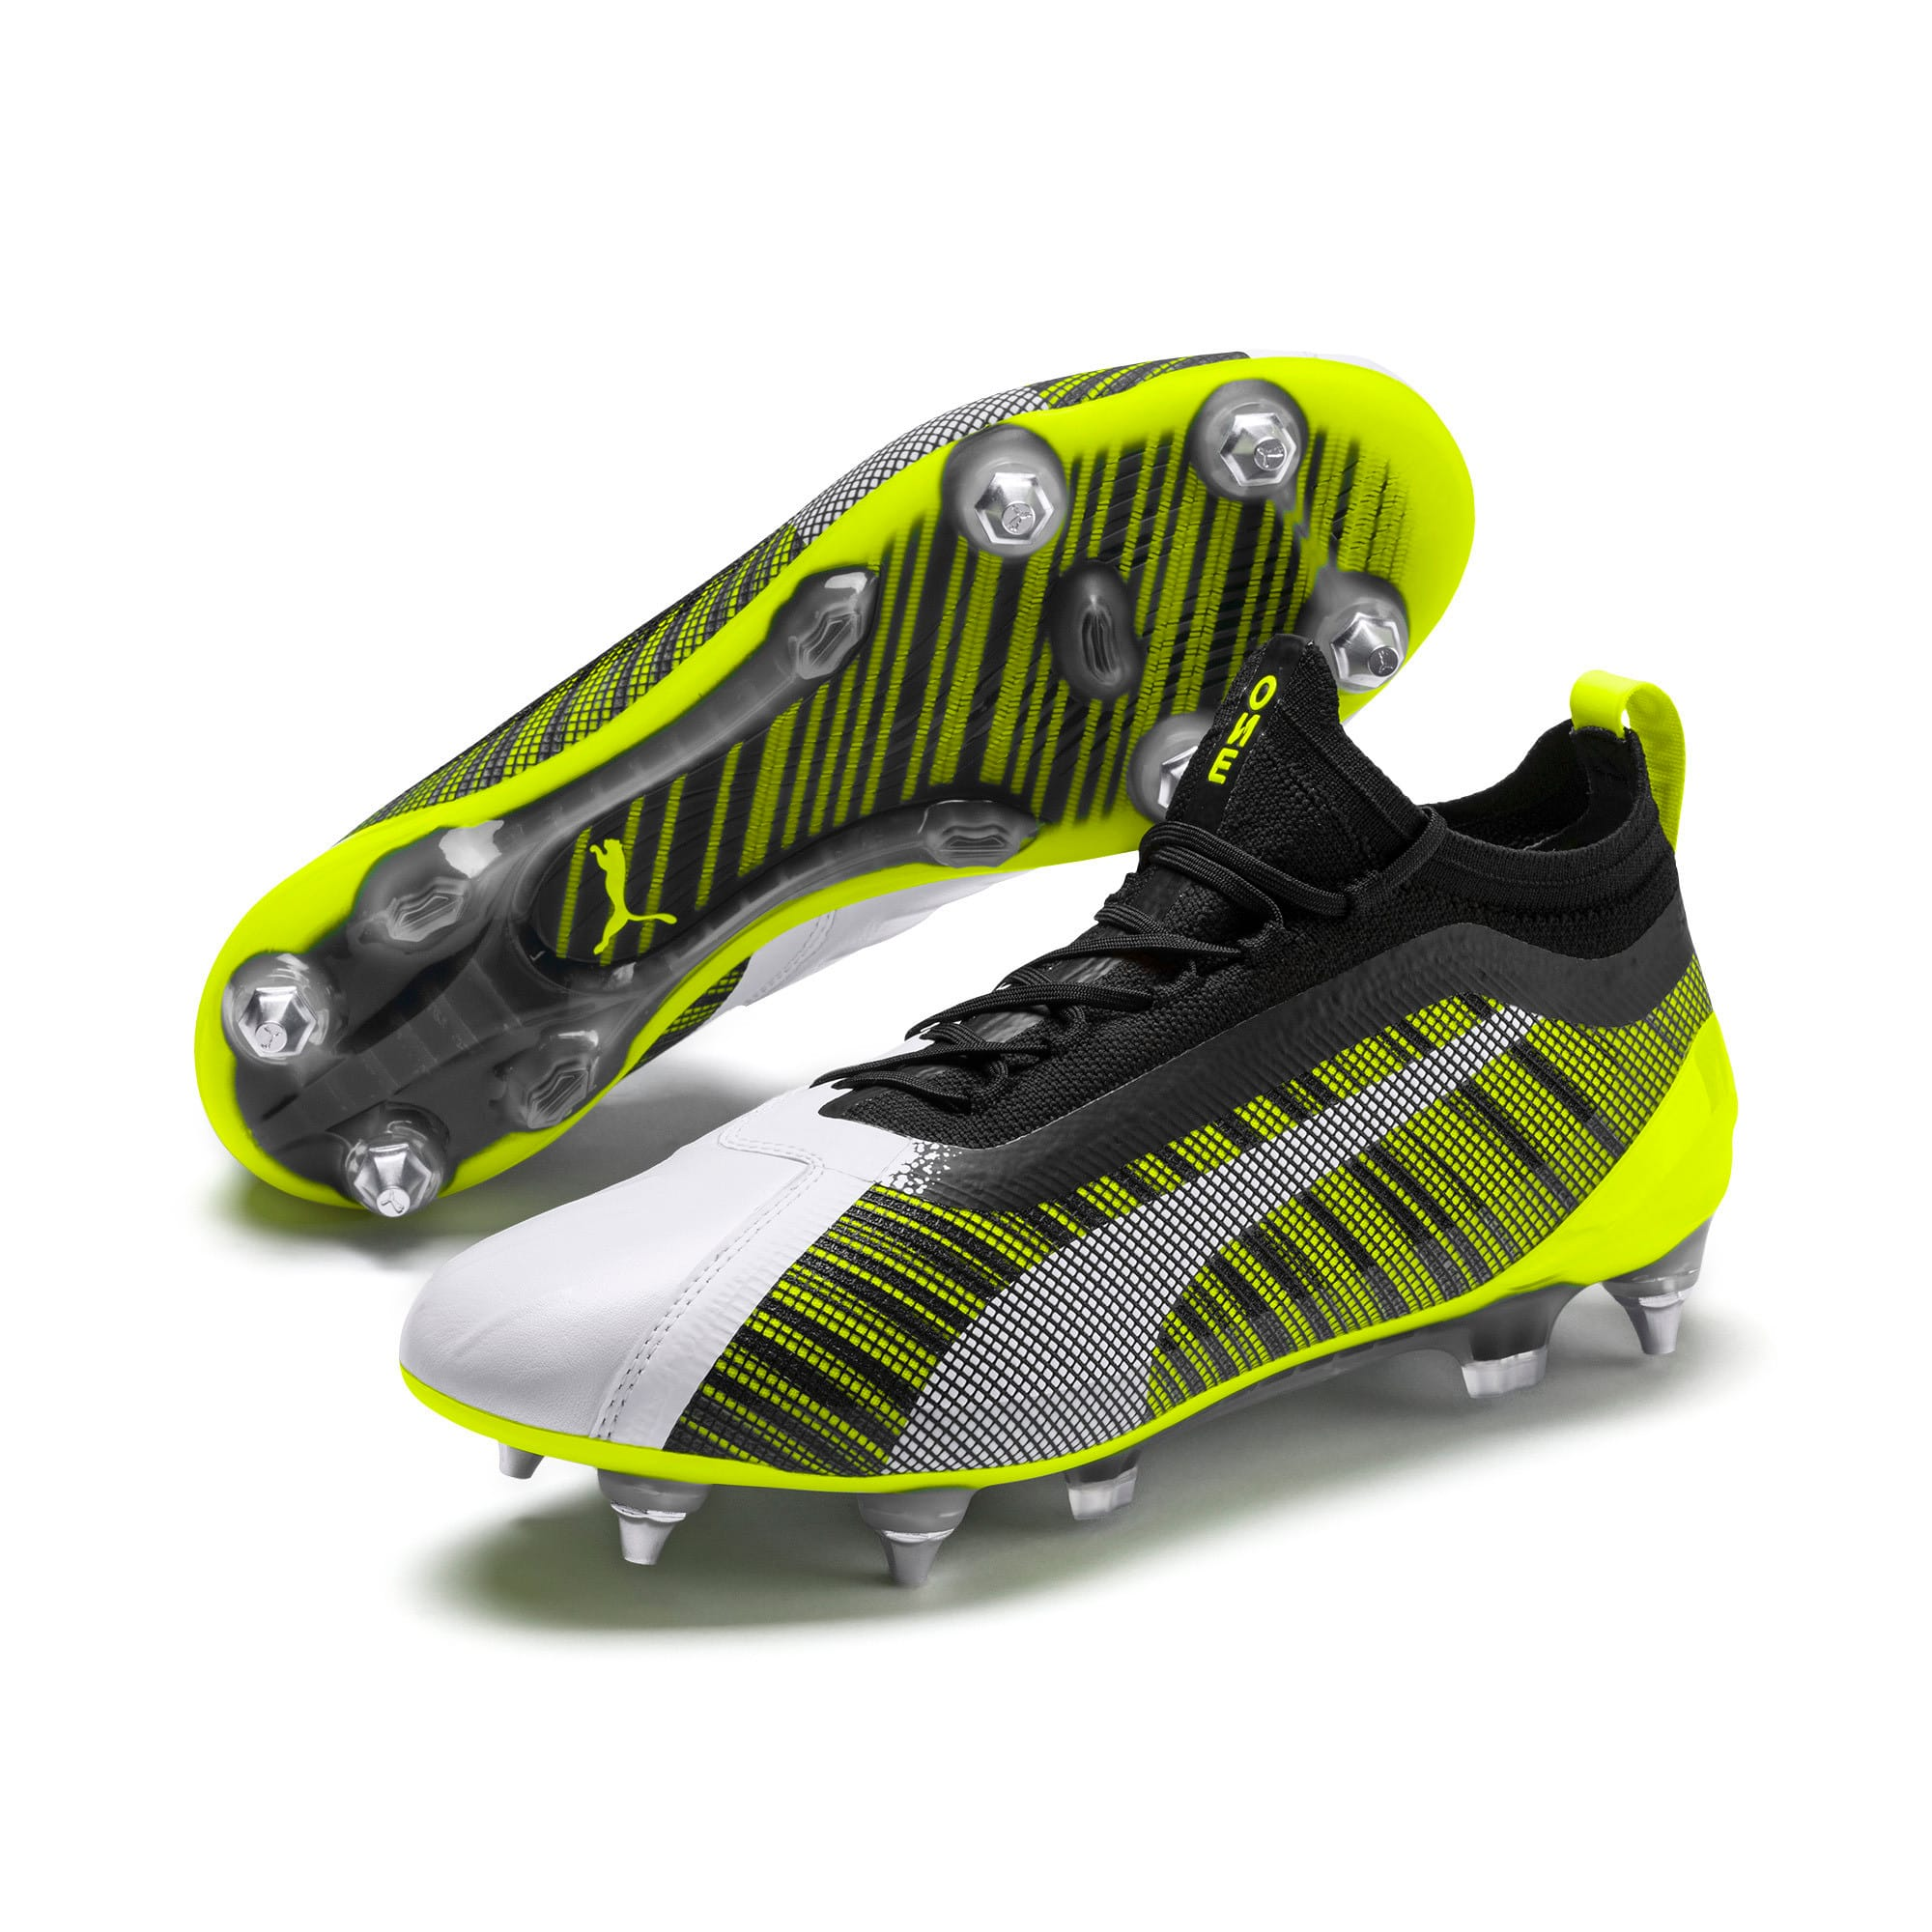 Thumbnail 3 of PUMA ONE 5.1 MxSG Football Boots, White-Black-Yellow Alert, medium